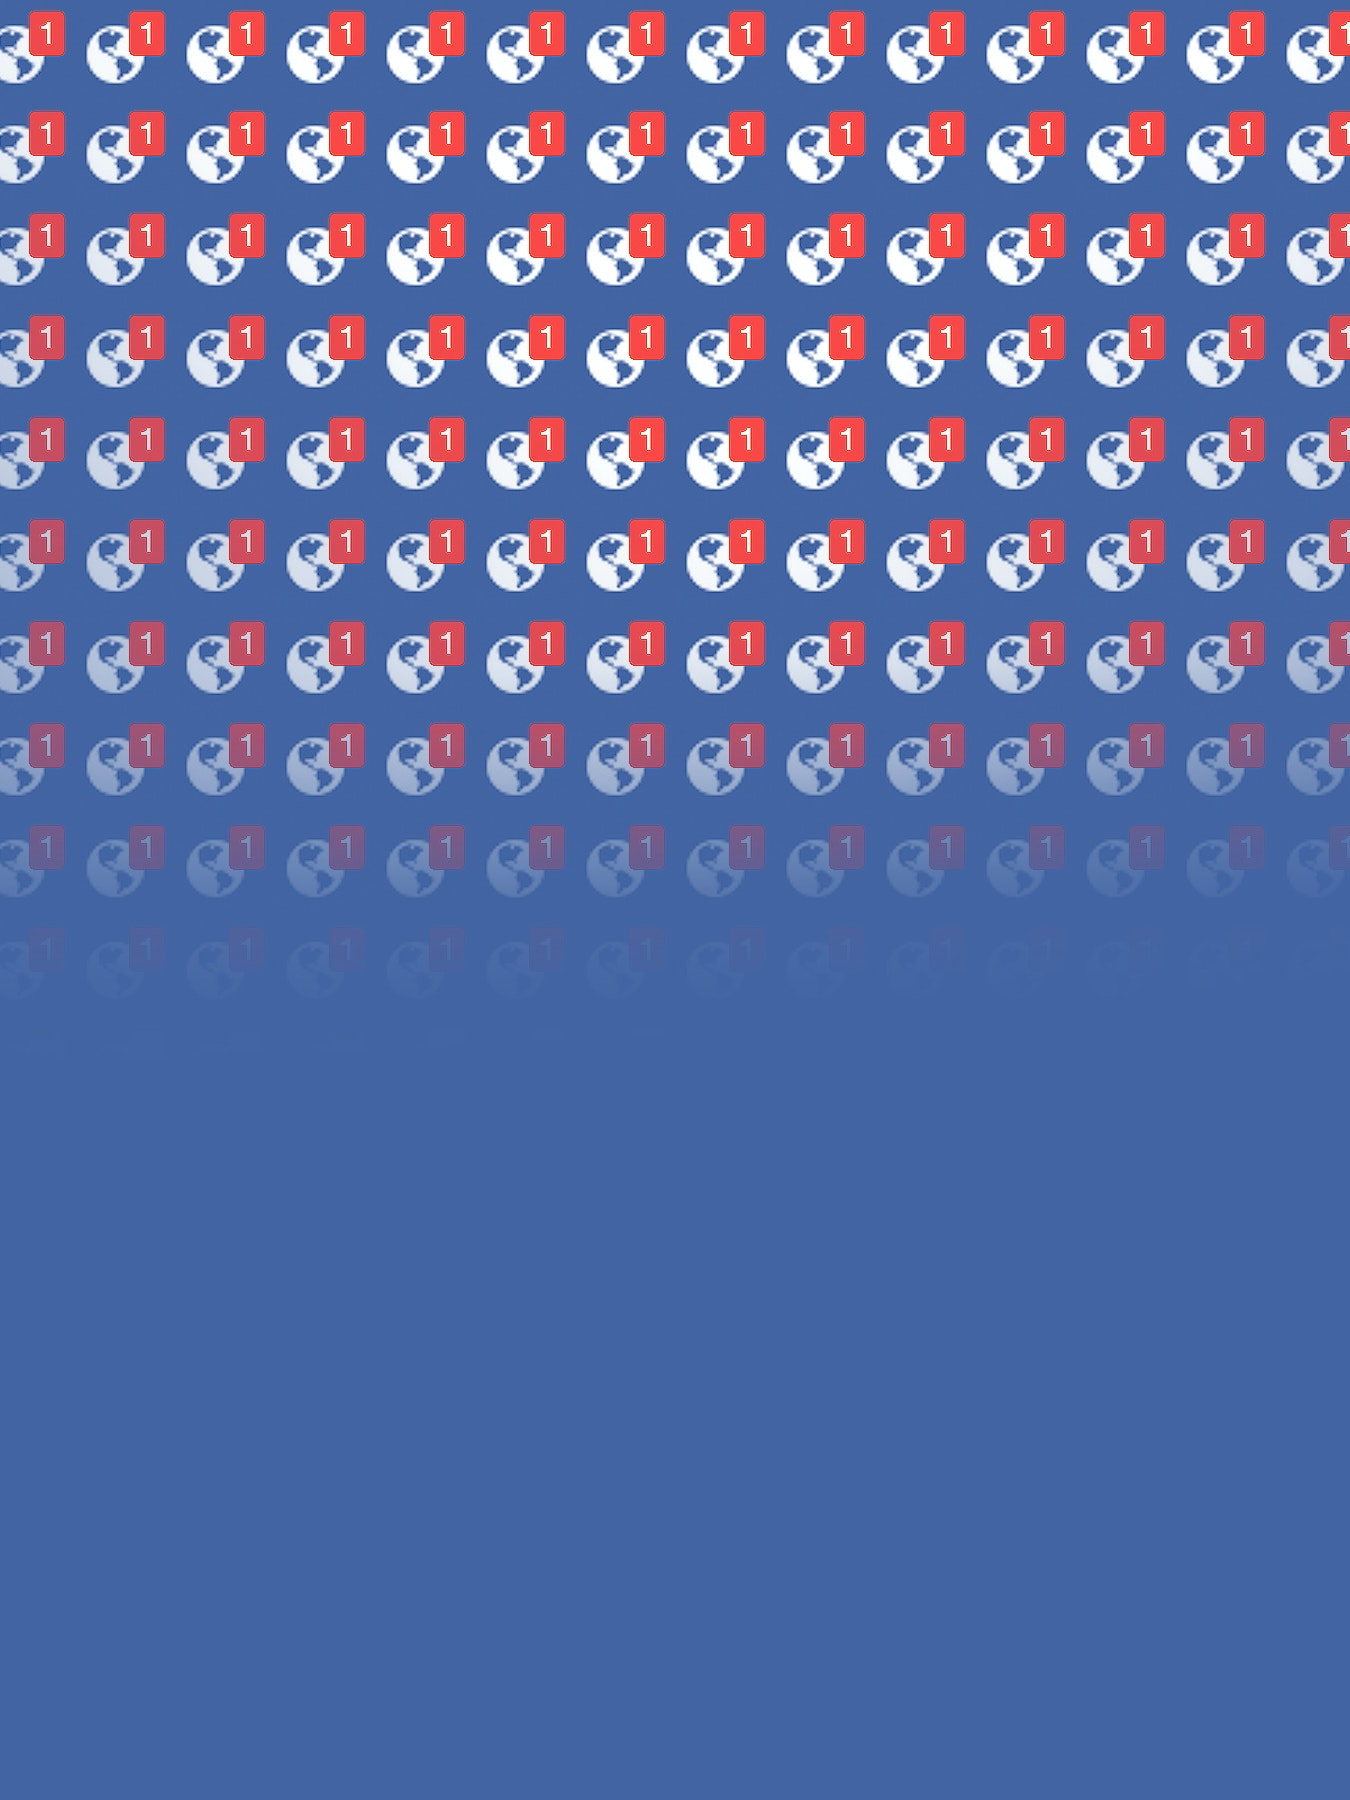 Facebook notification wallpaper